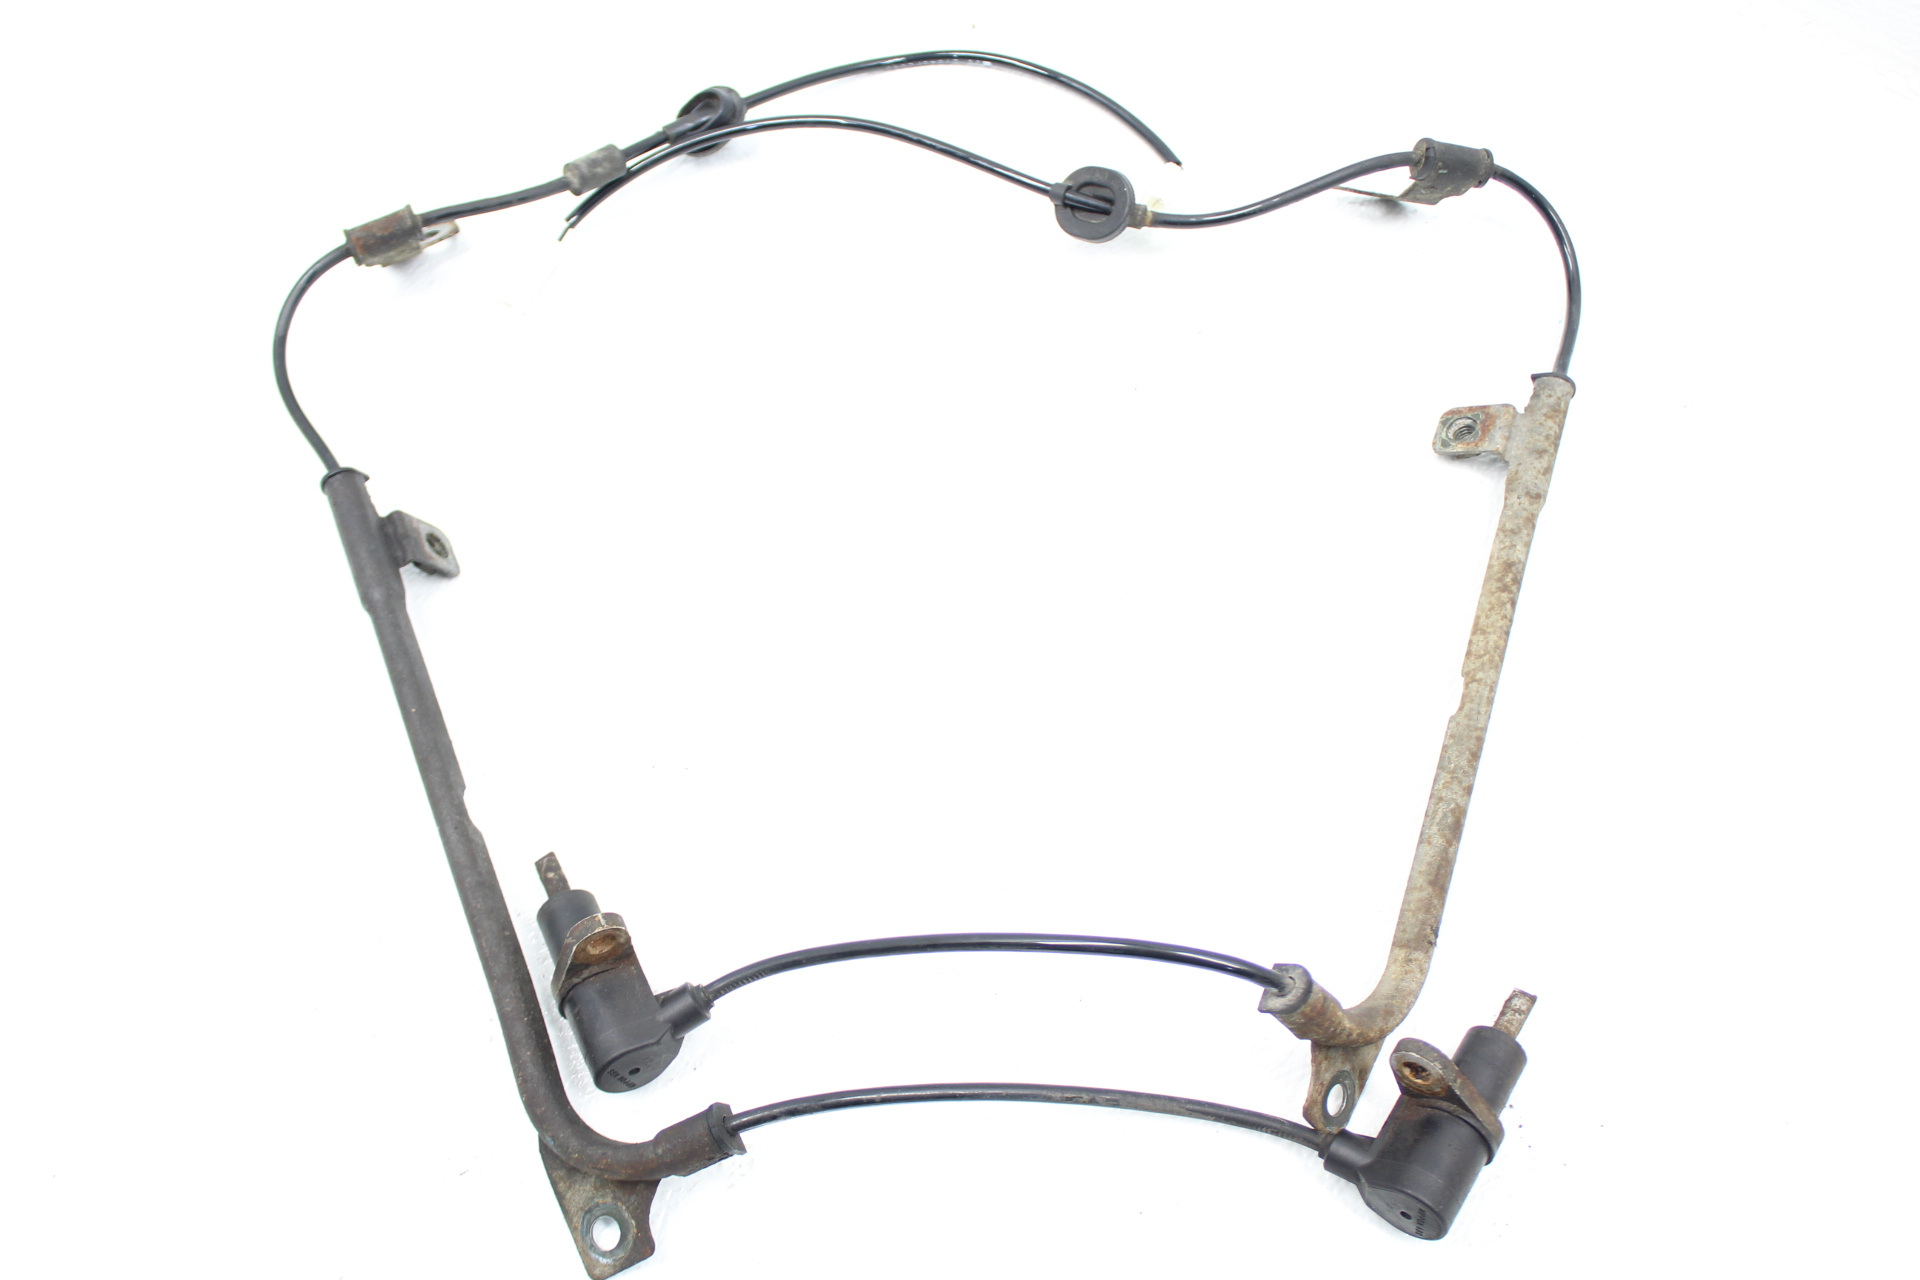 Subaru Impreza Wrx Amp Sti Rear Abs Sensors Lh Rh